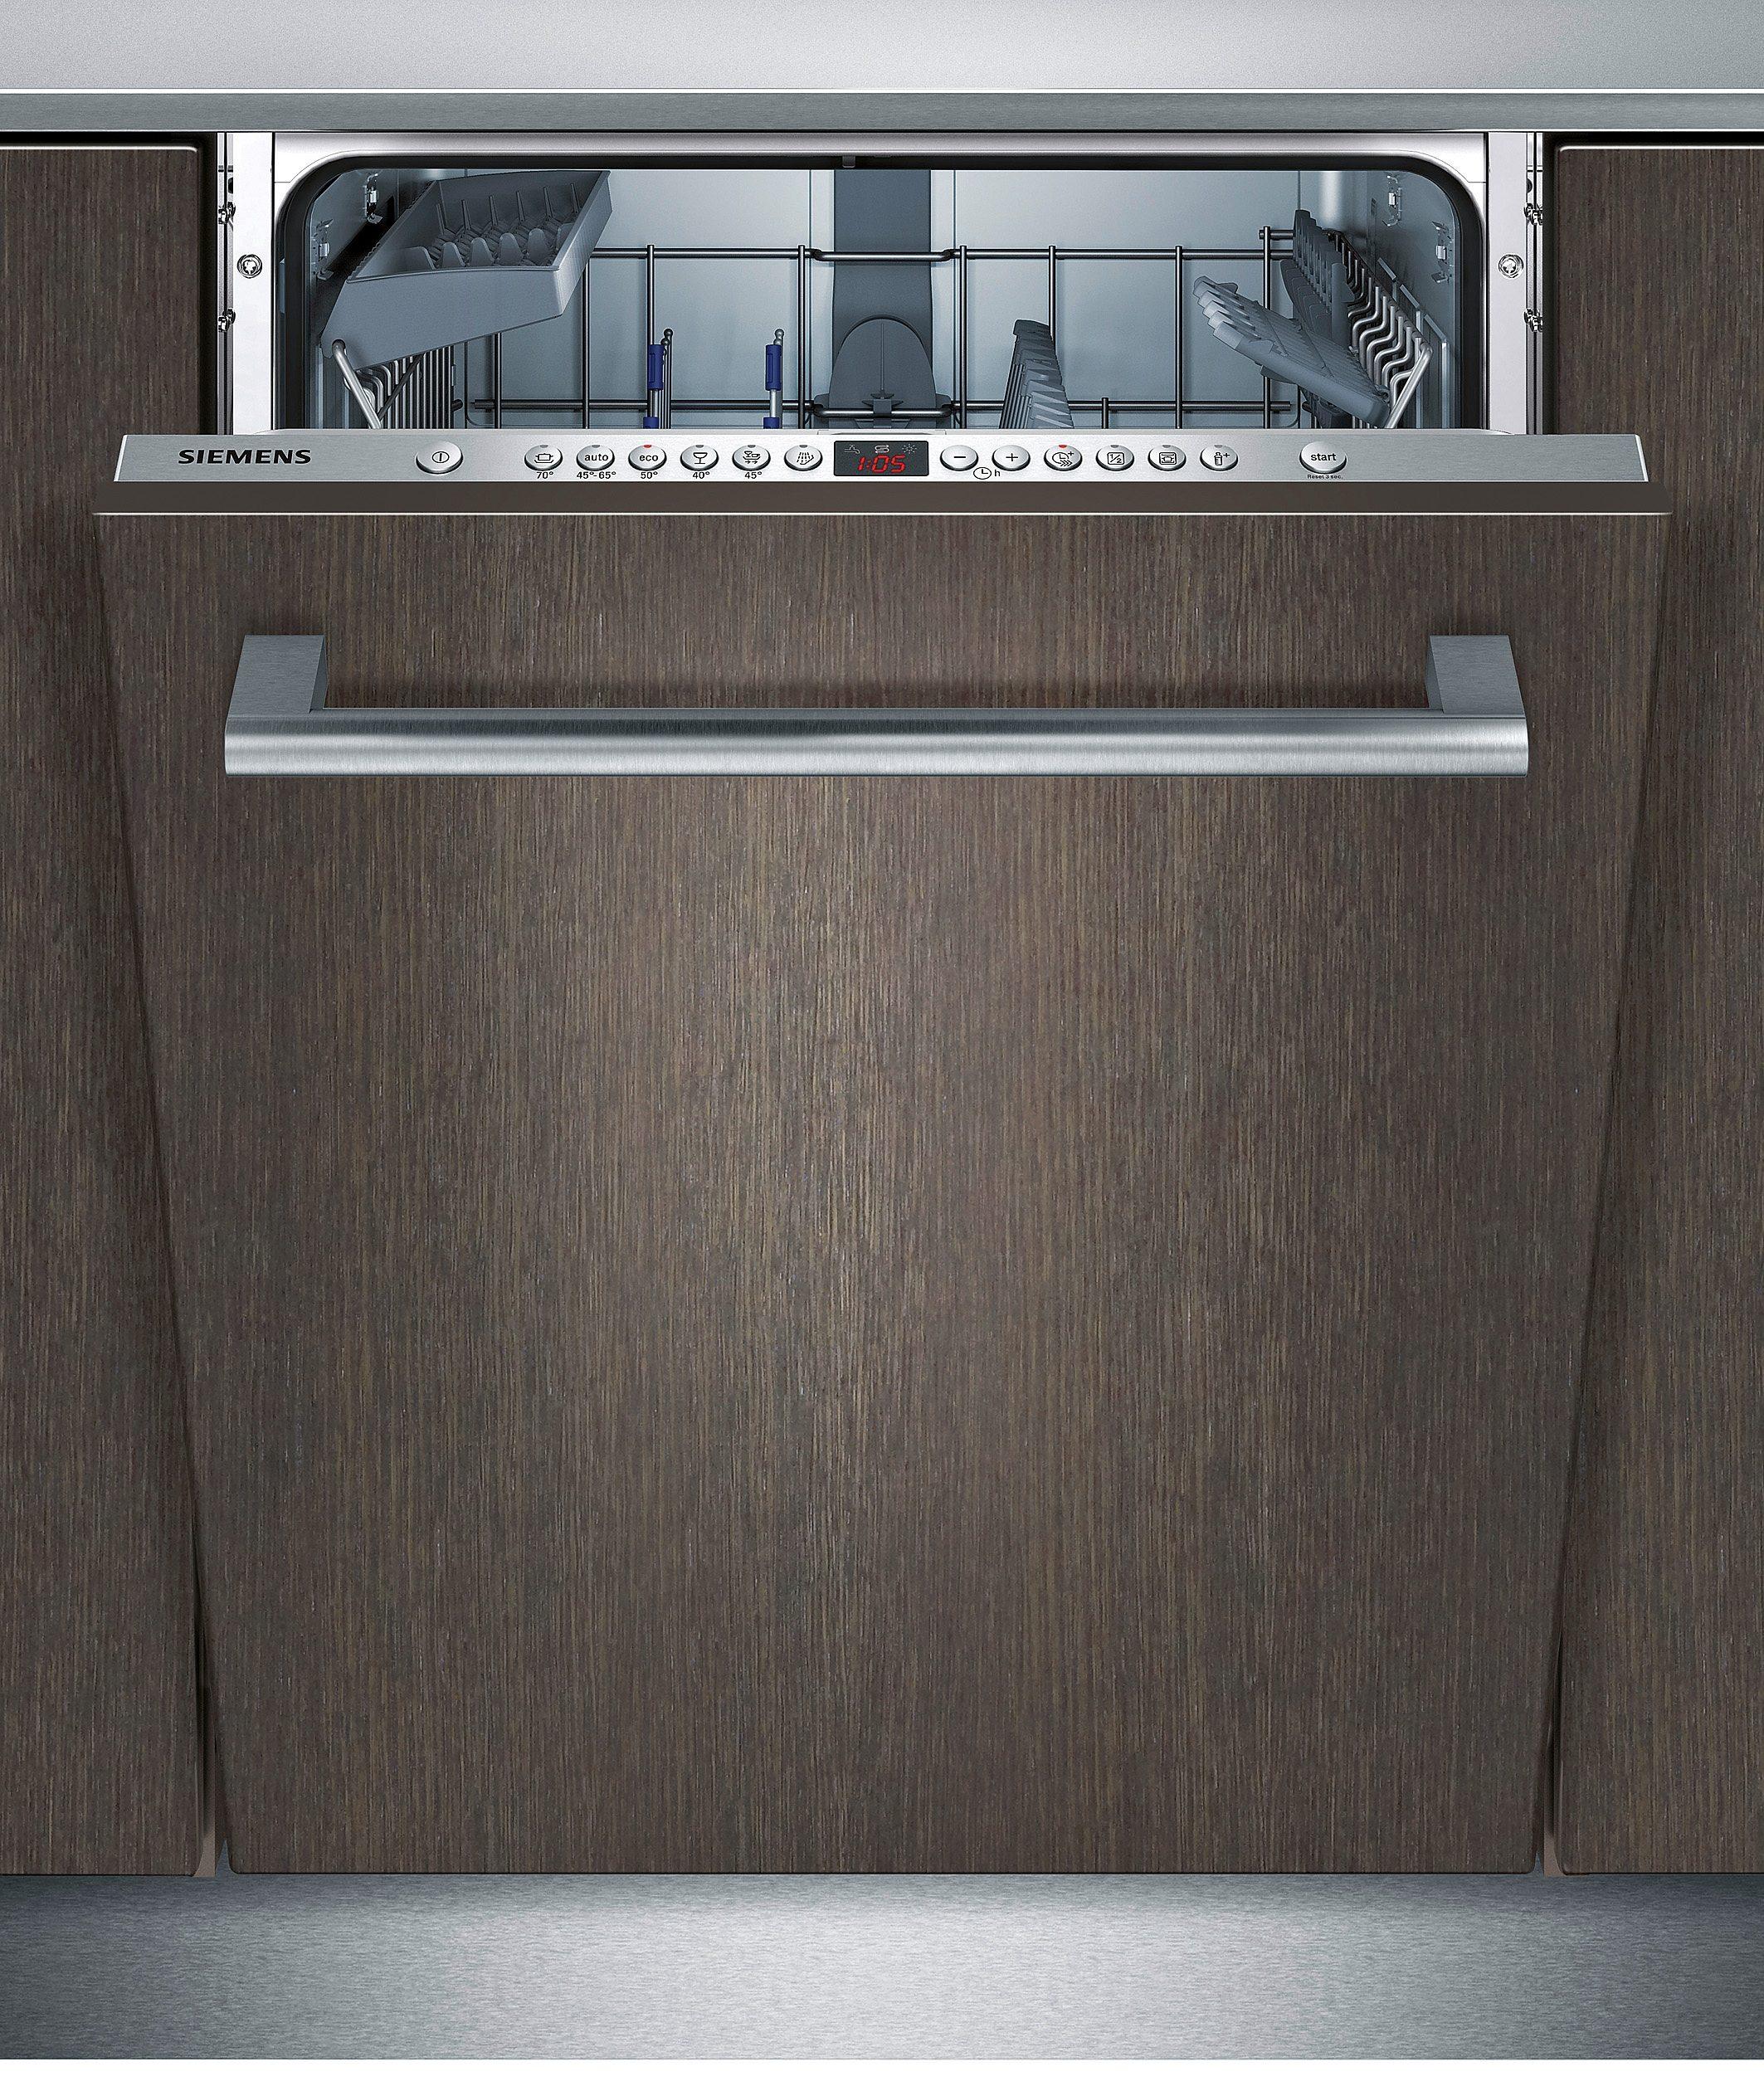 Siemens vollintegrierbarer Einbau-Geschirrspüler SX66P056EU, Energieklasse A++, 9,5 Liter